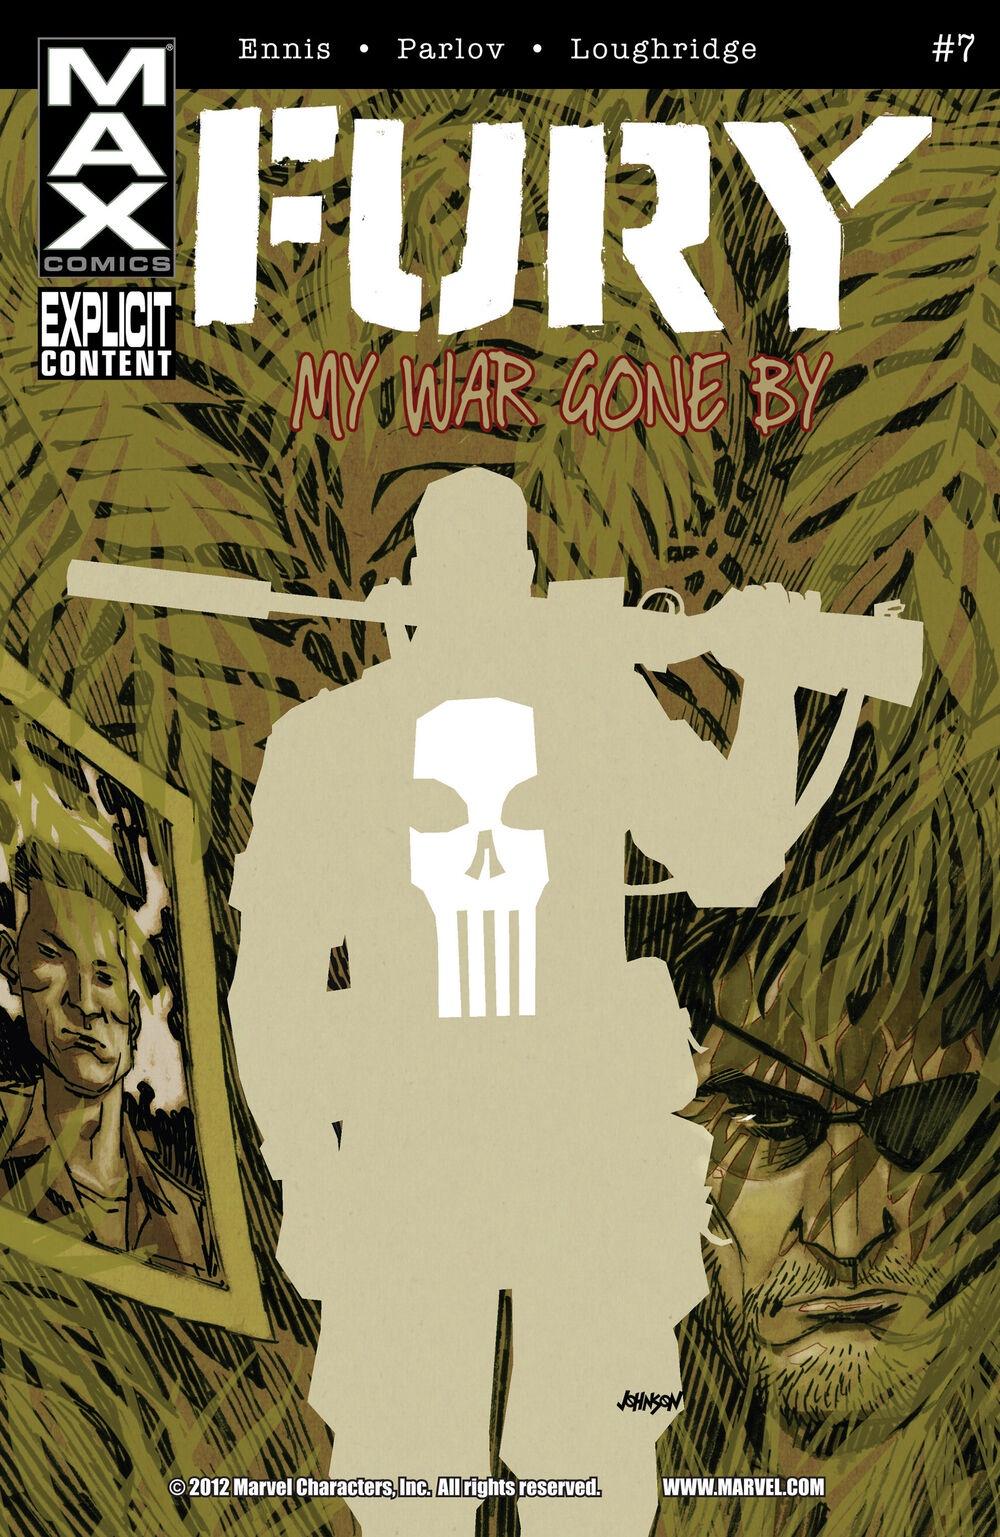 Ennis Parlov Loughridge Fury Max (2013 Marvel) #7 ennis parlov loughridge fury max 2012 marvel 4